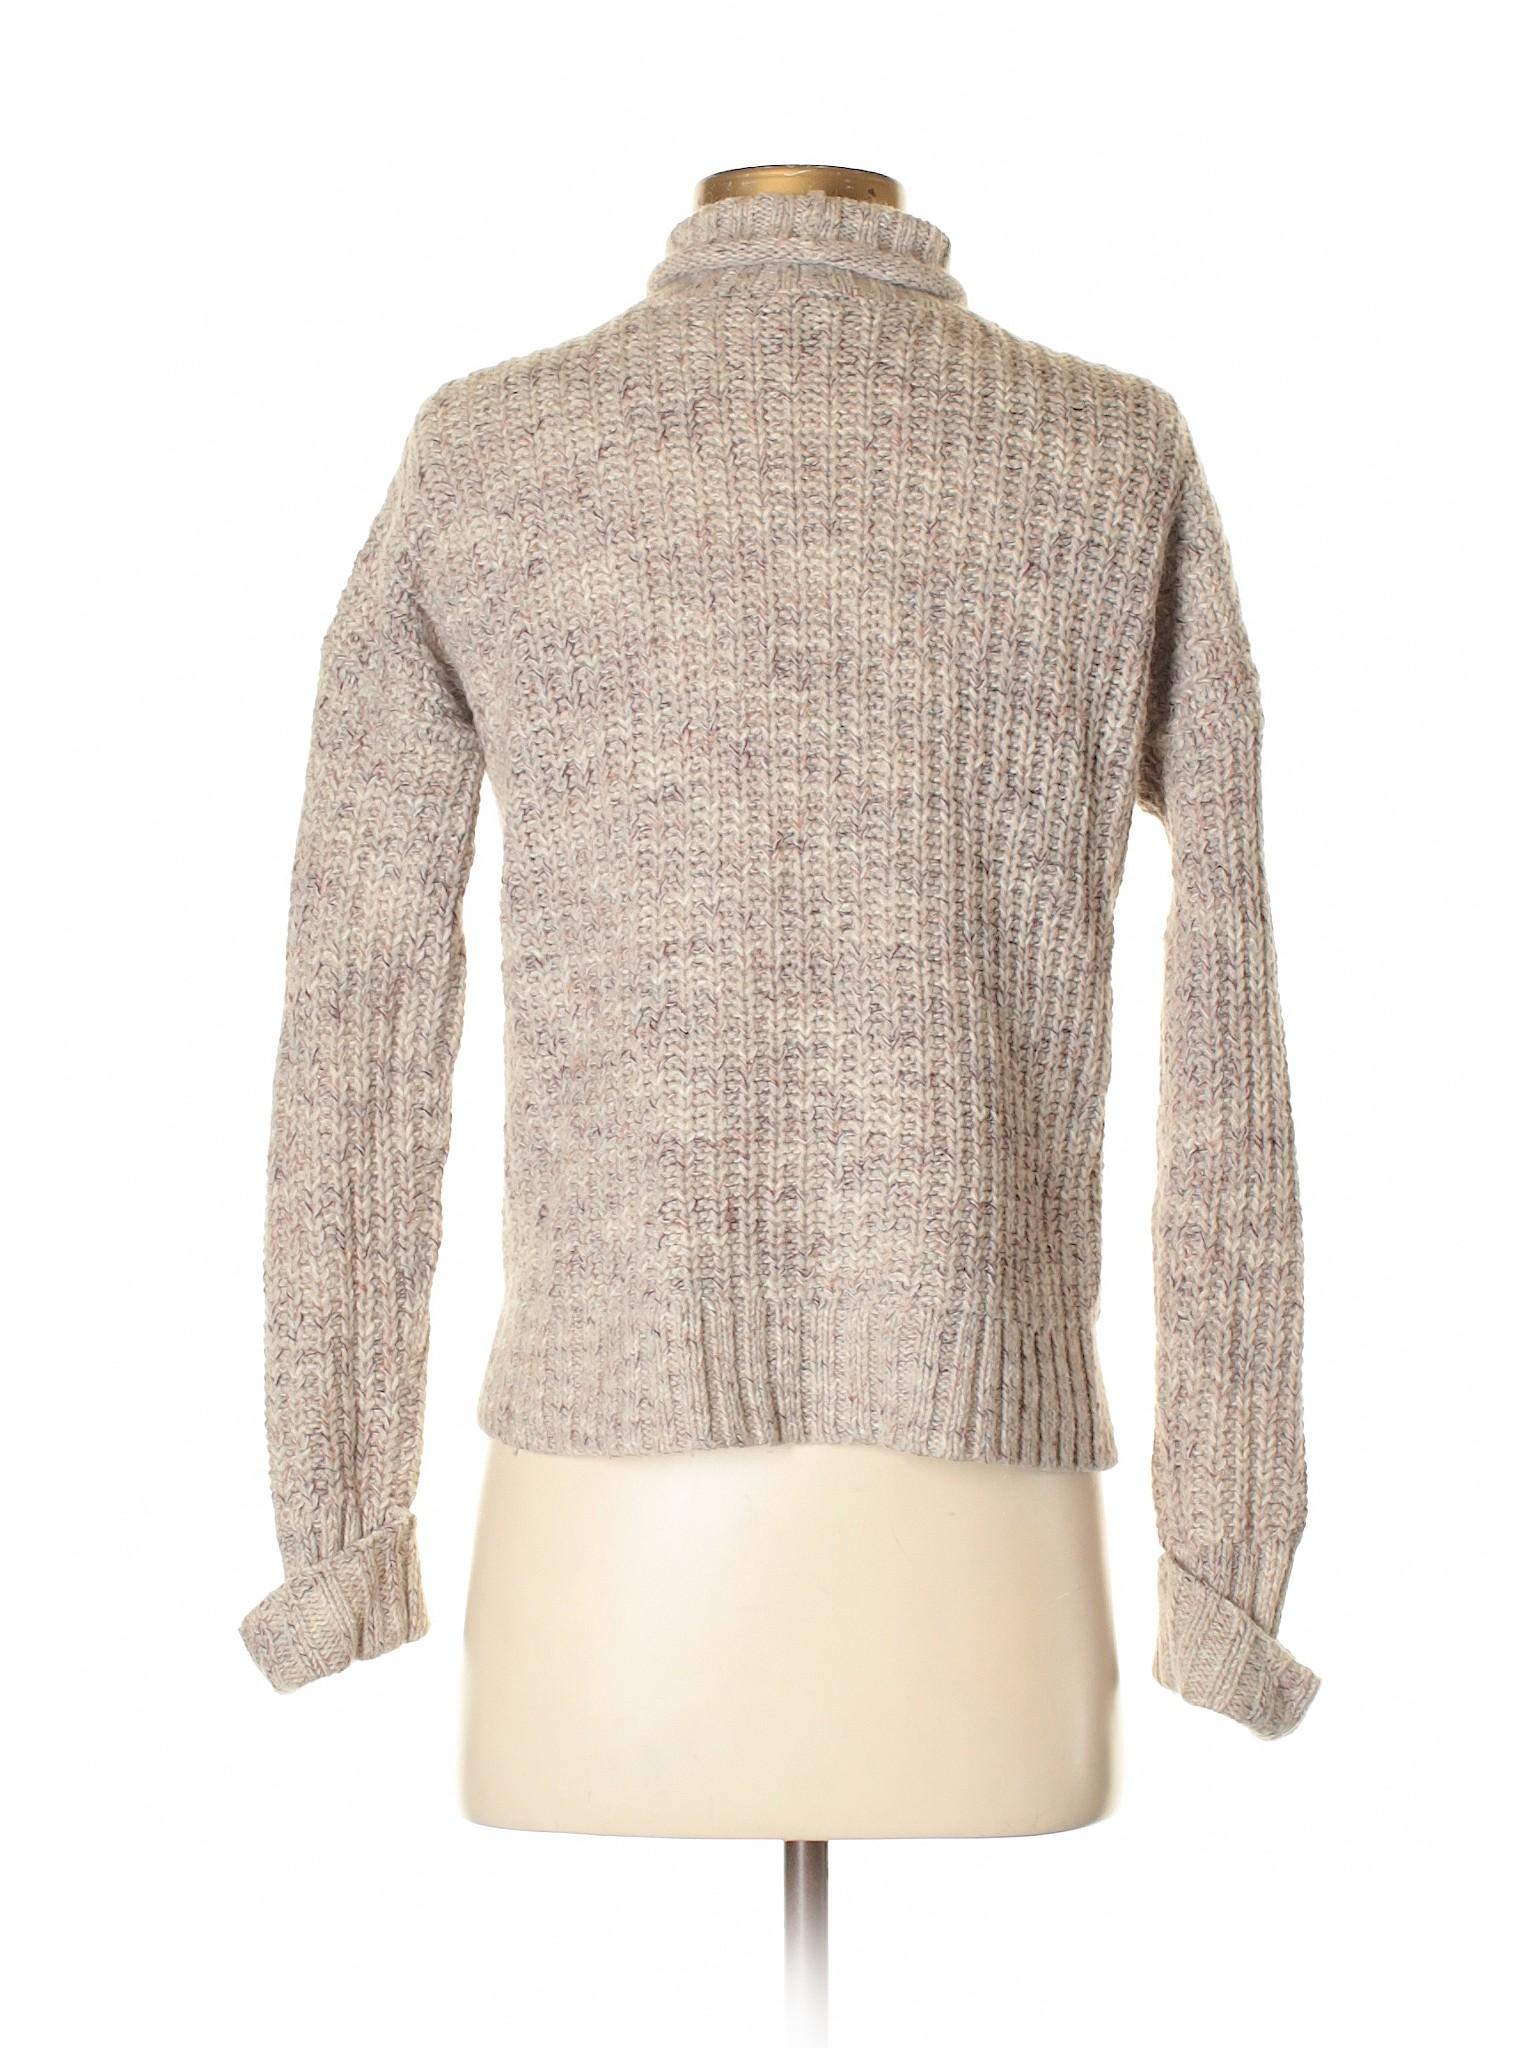 Sweater Turtleneck Express Express winter winter Boutique Boutique Turtleneck v4qg6